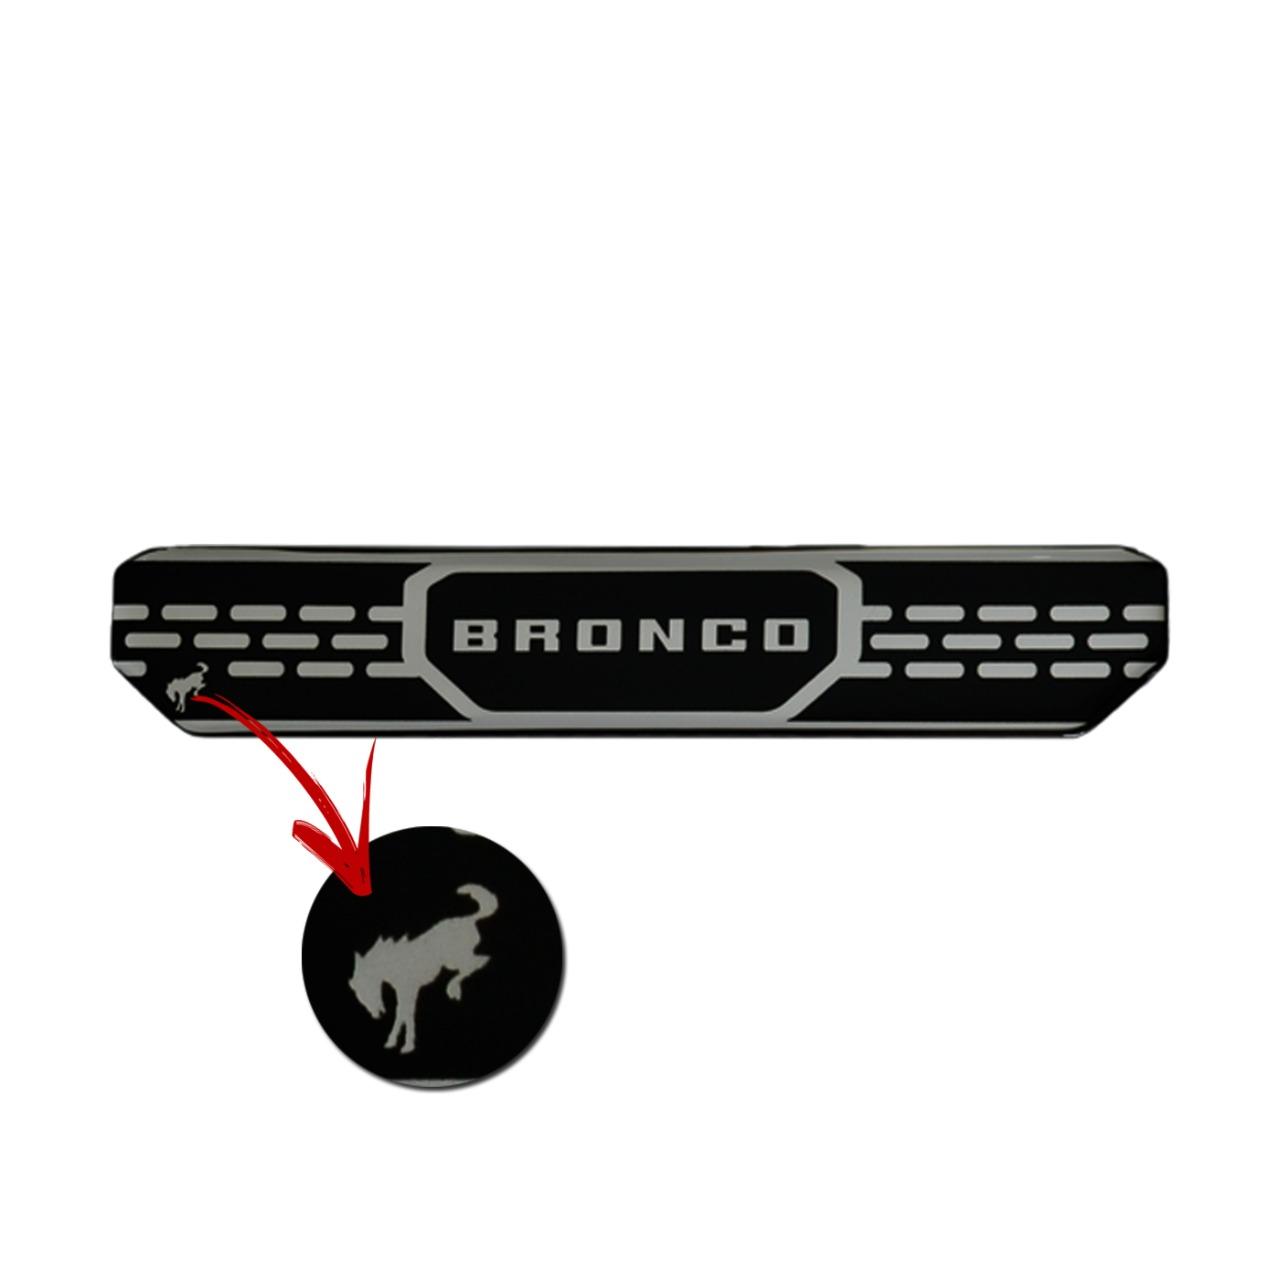 Soleira Porta Bronco Resinada Premium Elegance NP